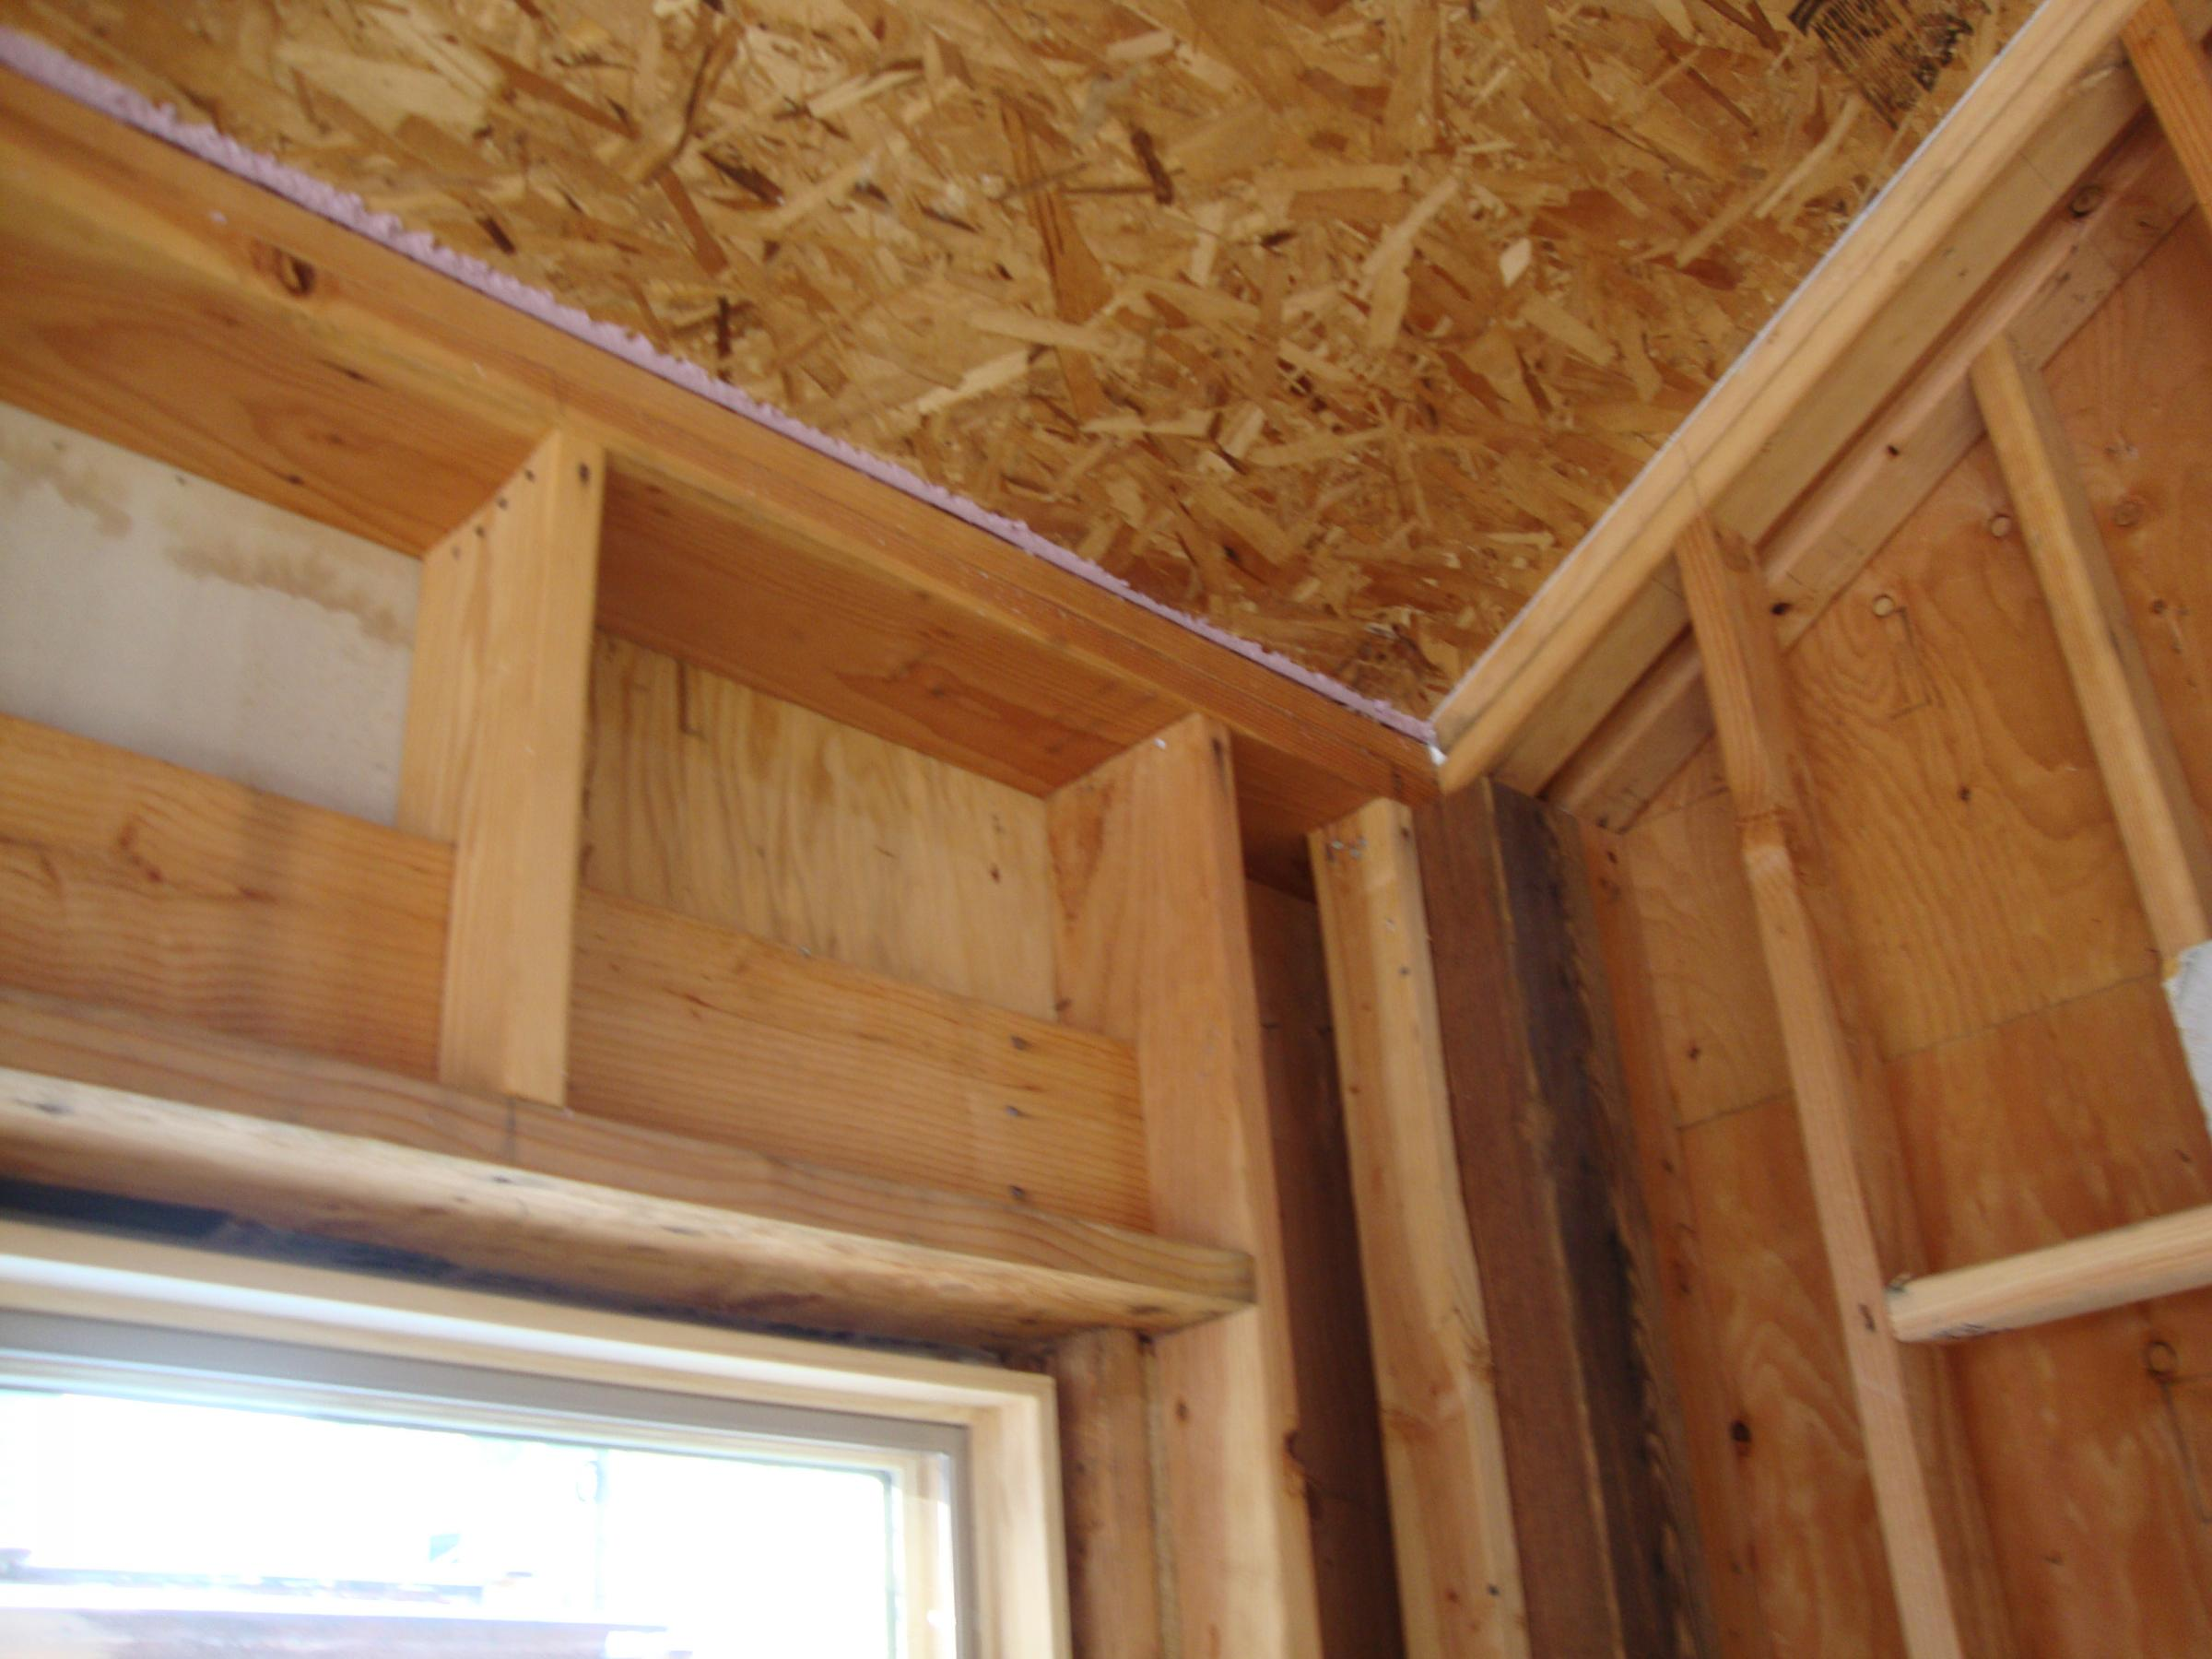 Open corners reduce thermal bridging